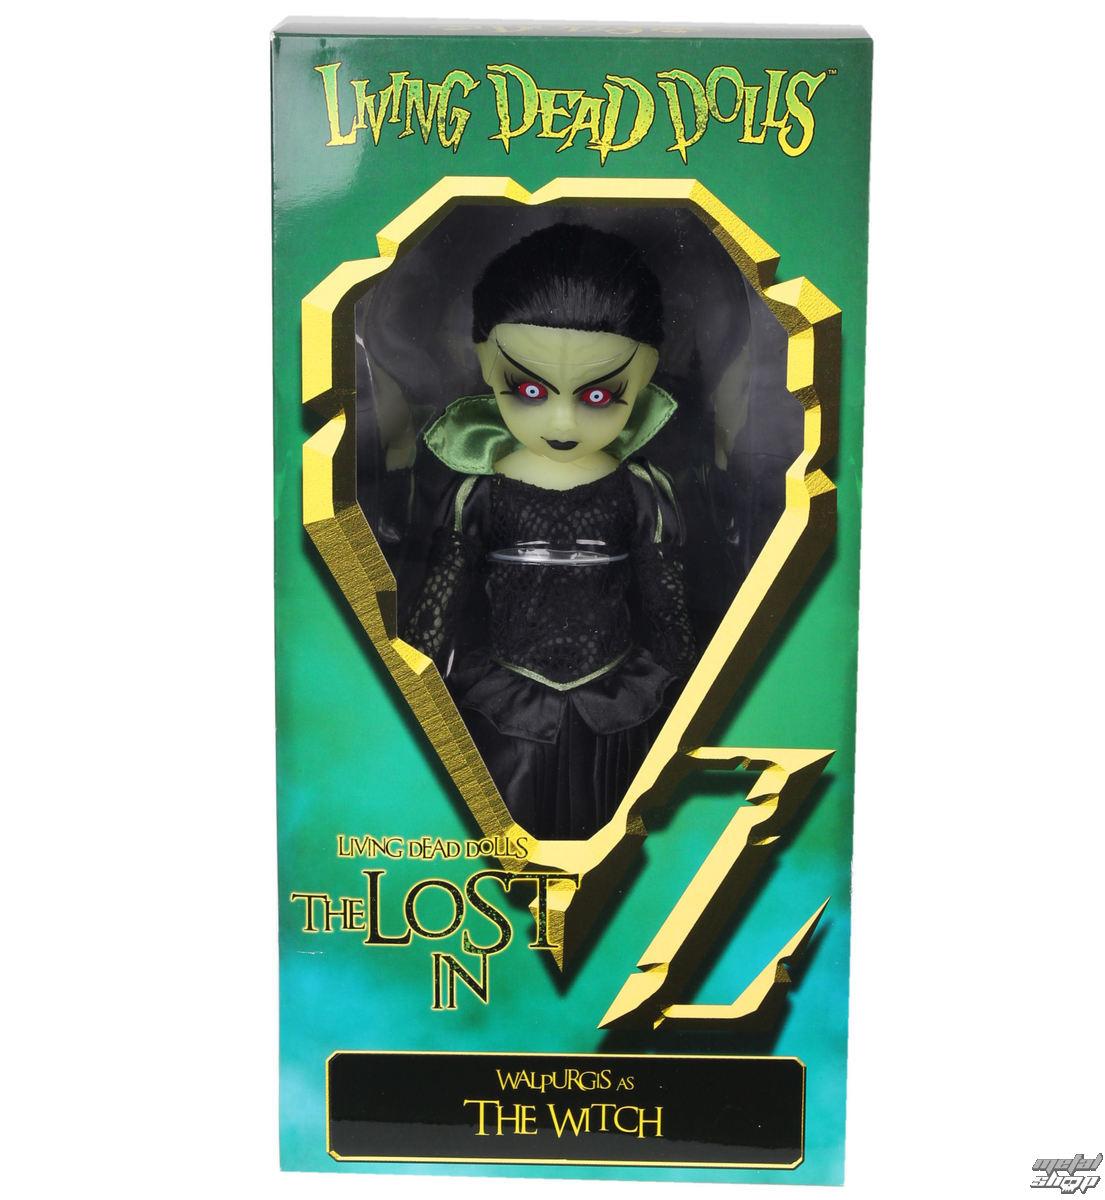 panenka LIVING DEAD DOLLS - Walpurgis as The Witch - MEZ94510-5